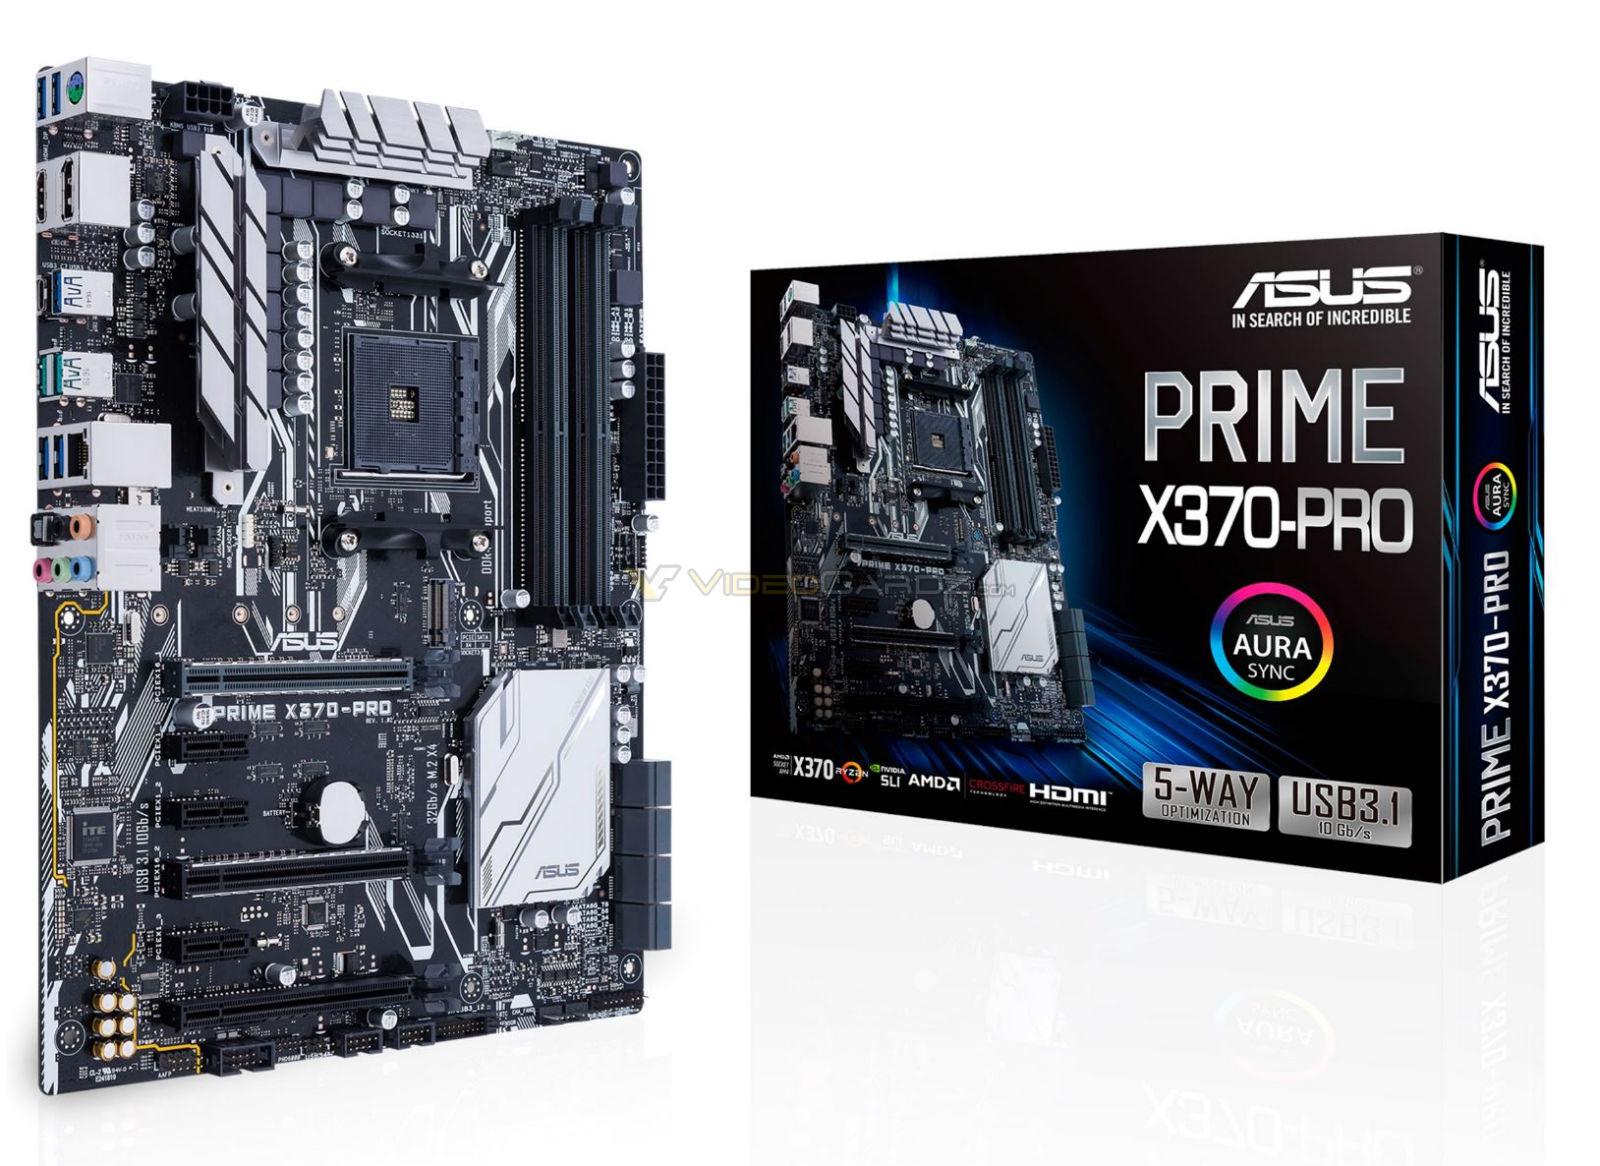 ASUS-X370-PRIME-PRO-1